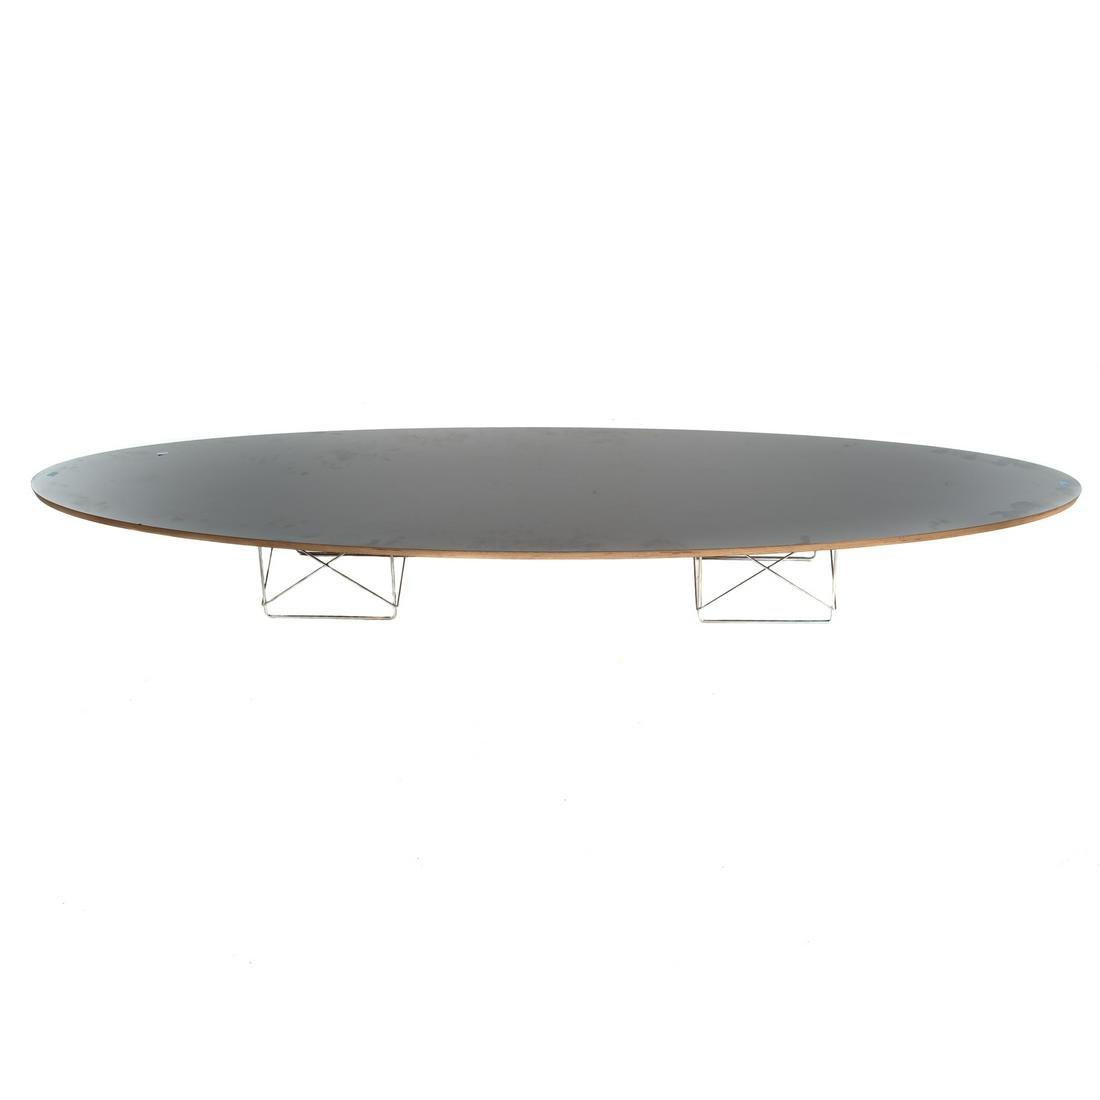 Eames Black Laminated Wood Surfboard Table